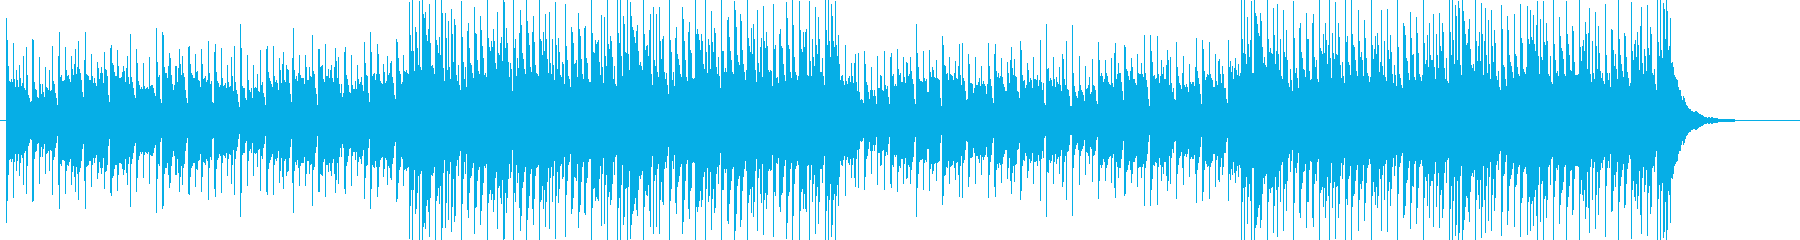 Happy Ukulele 18の再生済みの波形